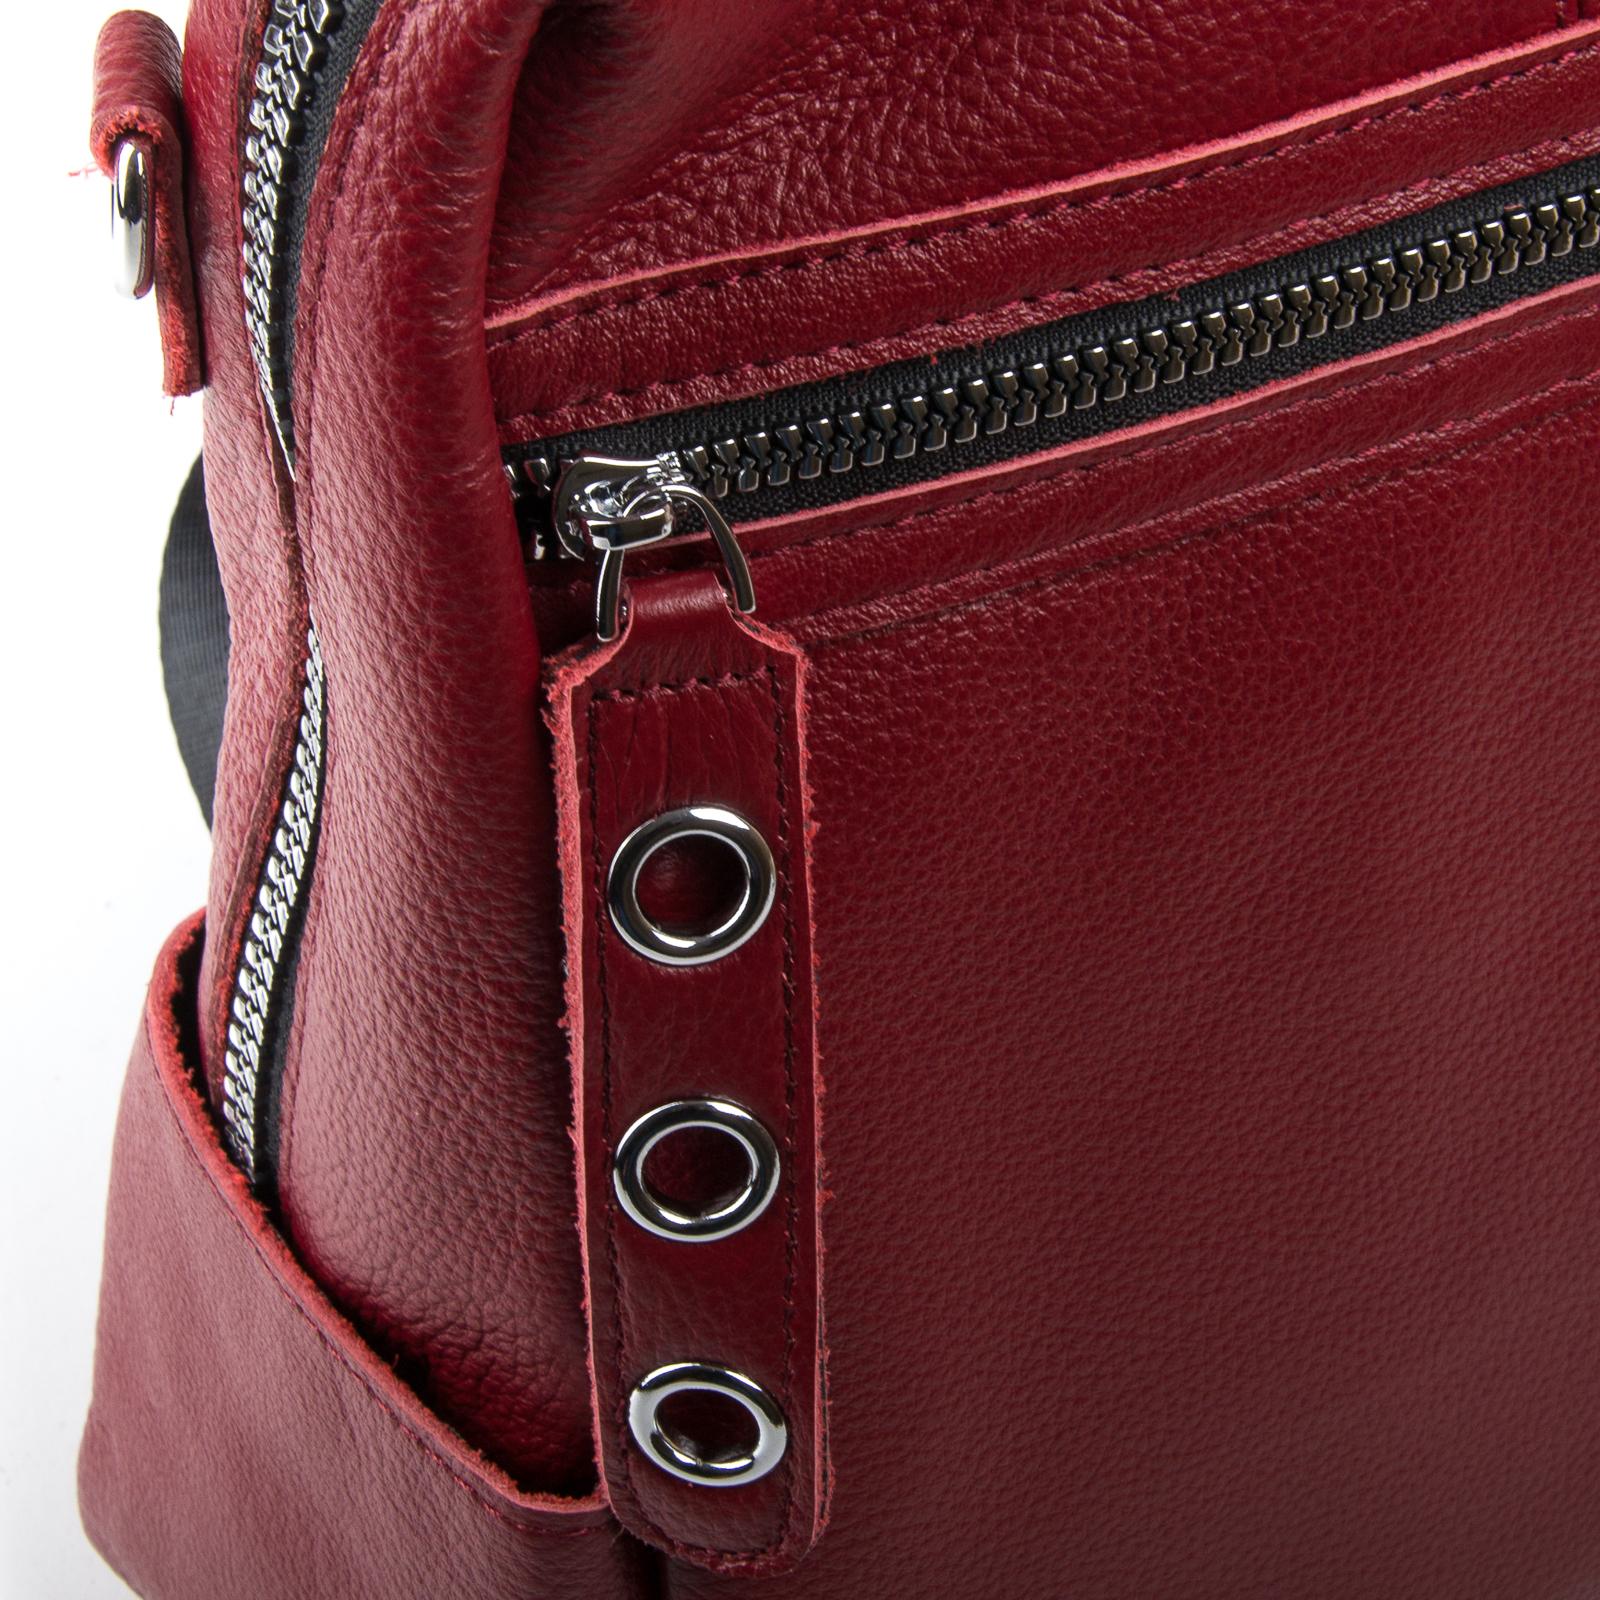 Сумка Женская Рюкзак кожа ALEX RAI 03-01 8781-9 bordo - фото 3